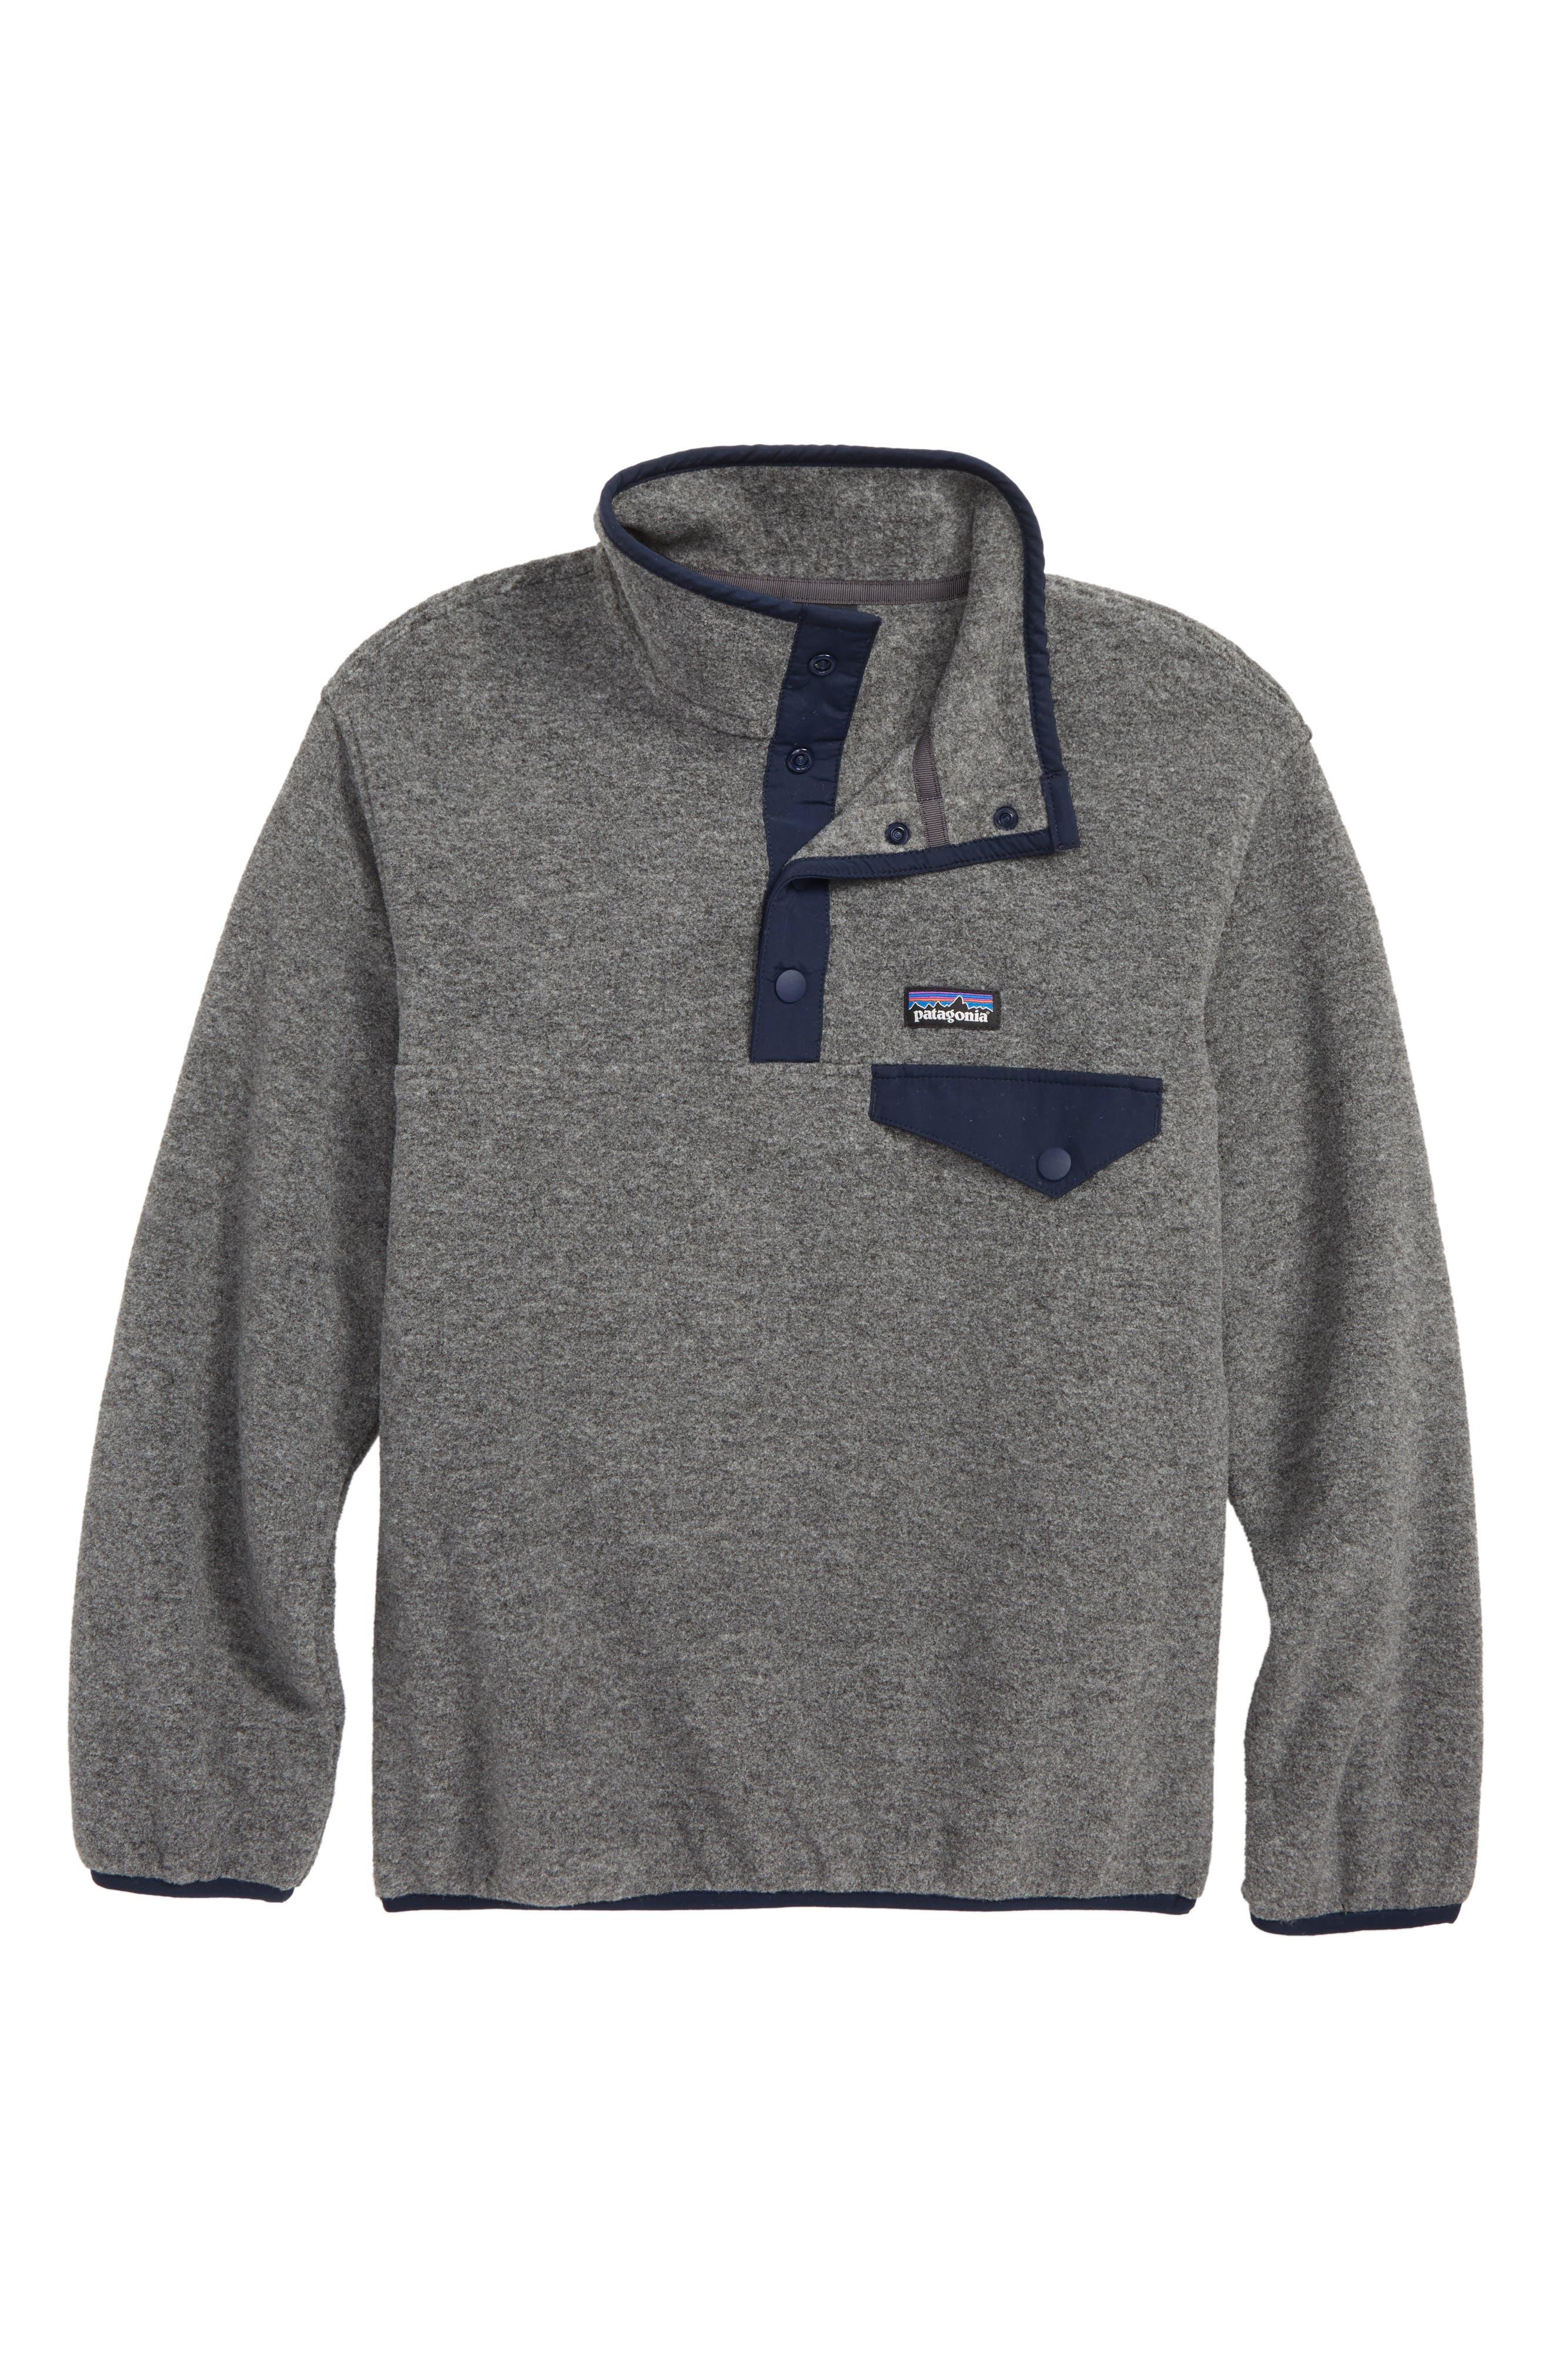 Boys Patagonia Synchilla SnapT Fleece Pullover Size XL (14)  Blue